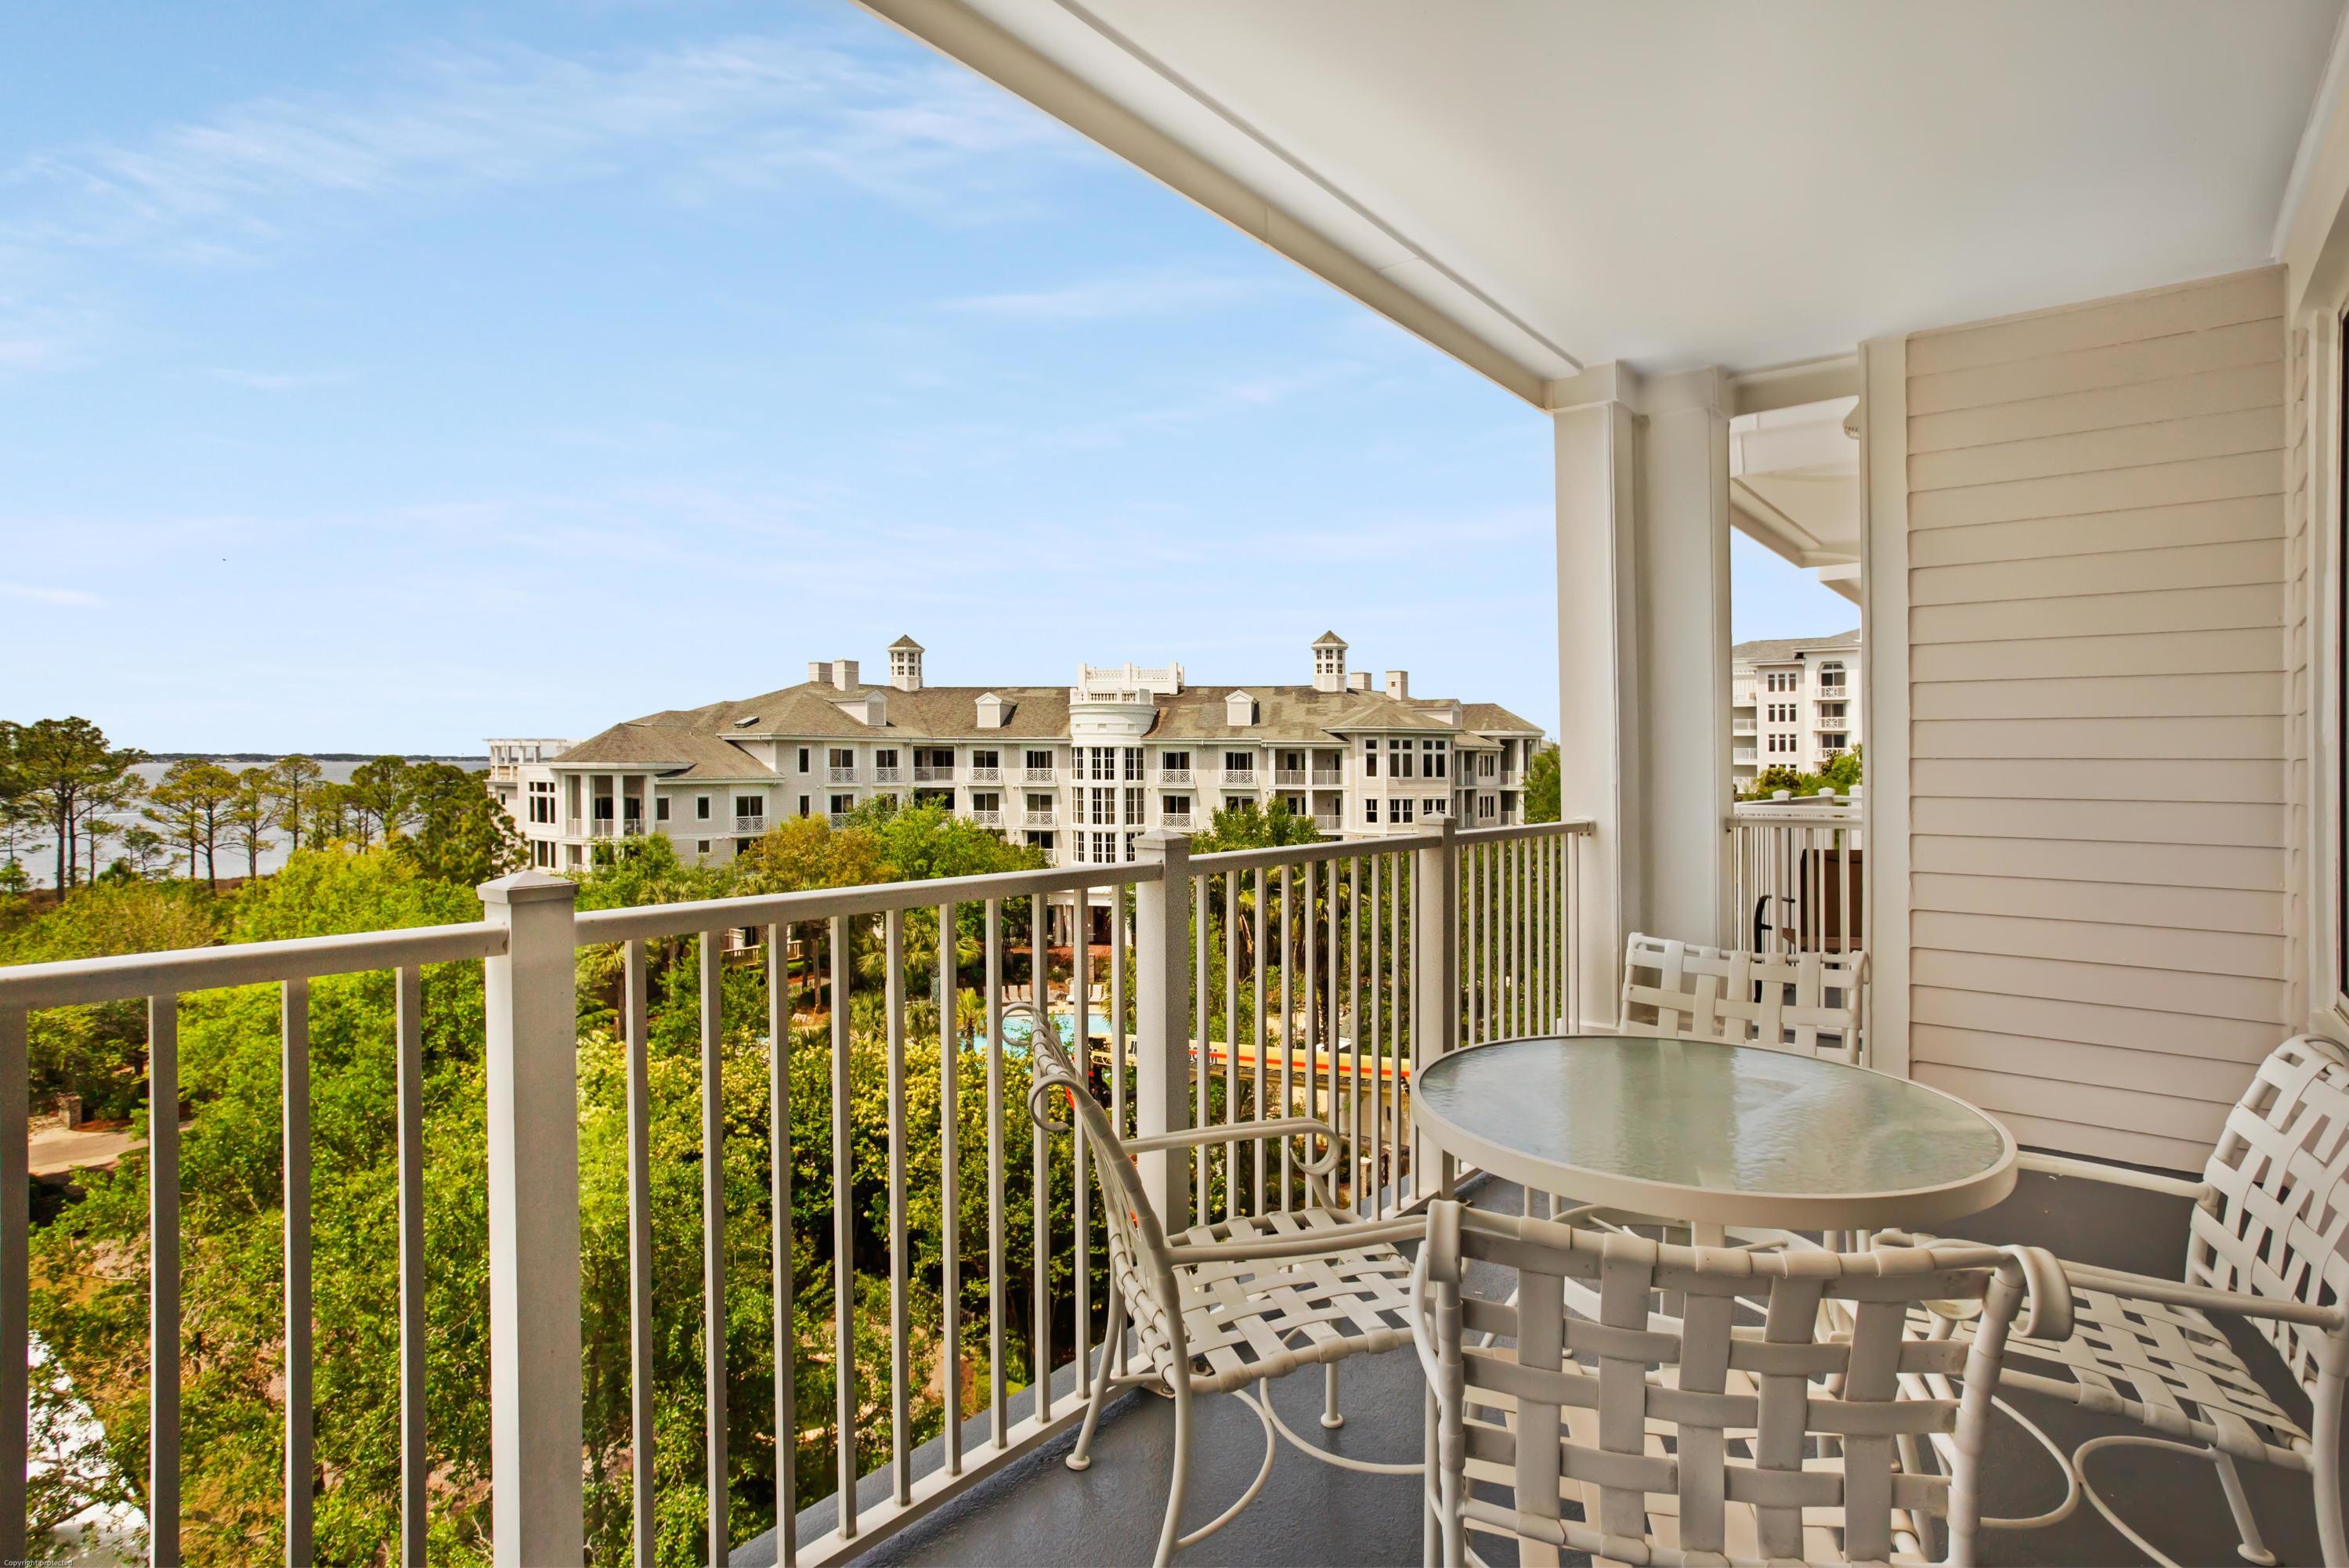 A 2 Bedroom 3 Bedroom Grand Sandestin Condominium